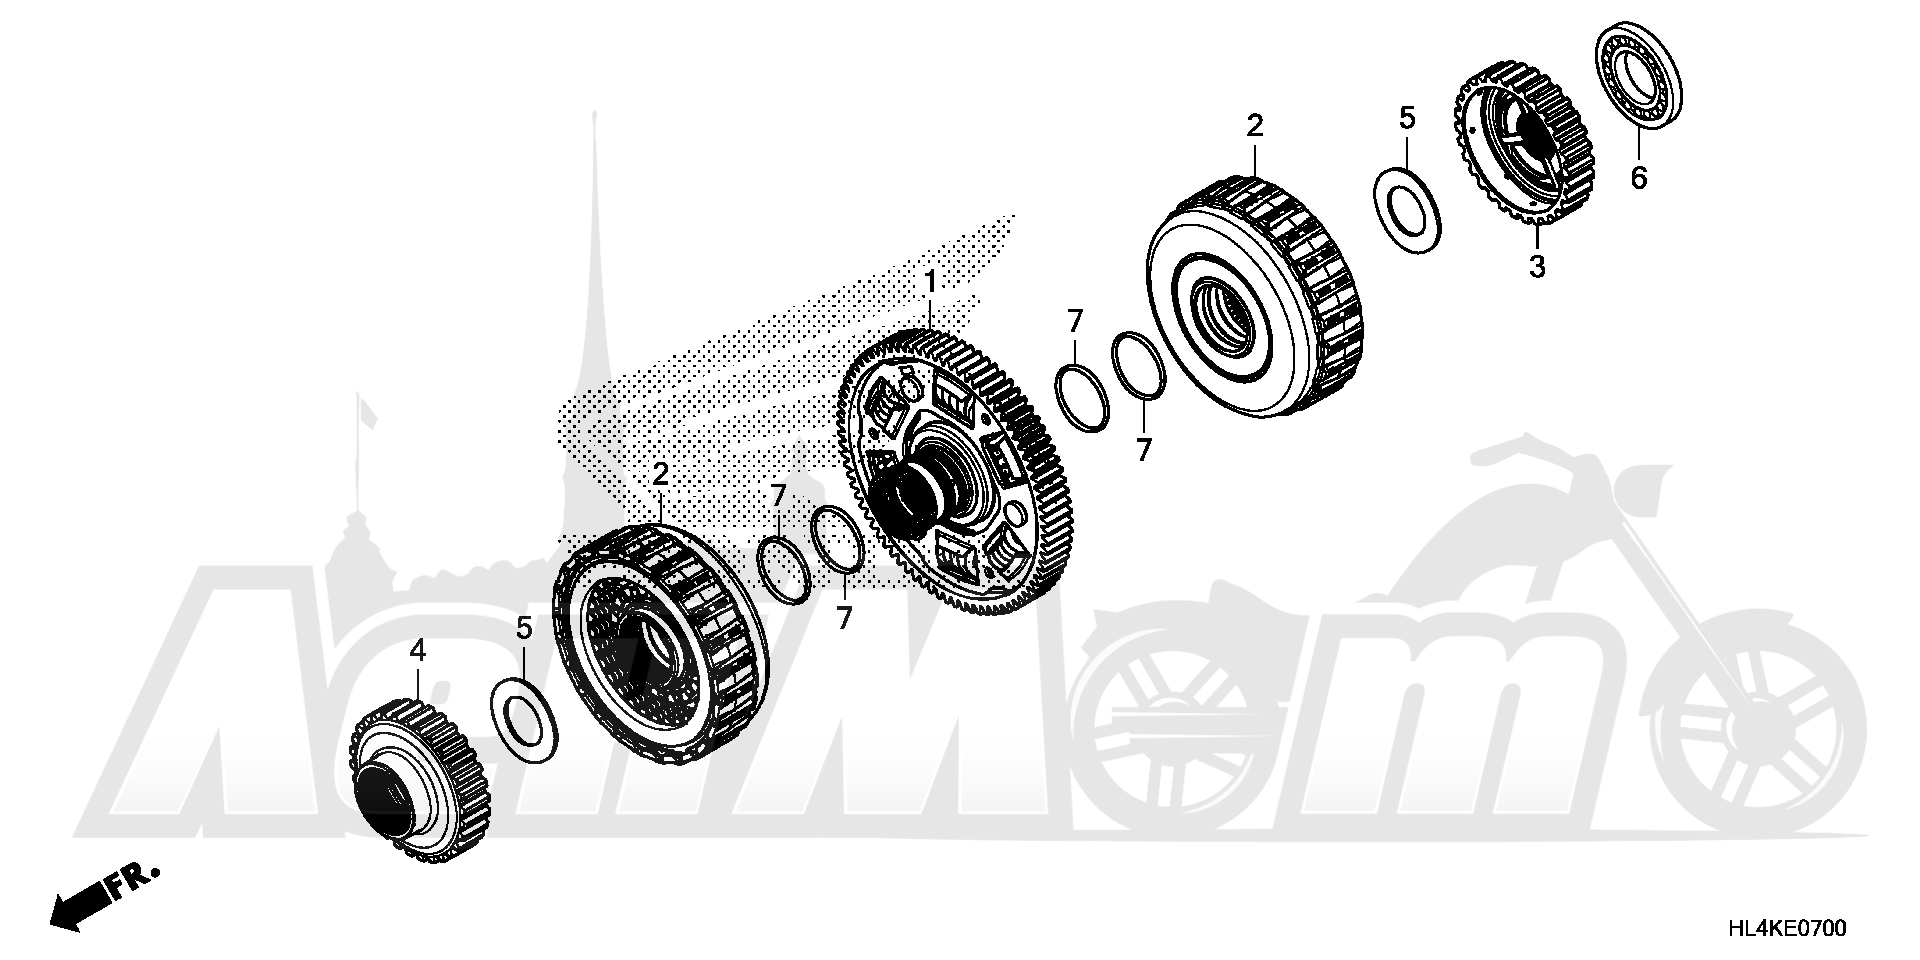 Запчасти для Квадроцикла Honda 2019 SXS1000M5D Раздел: CLUTCH | сцепление